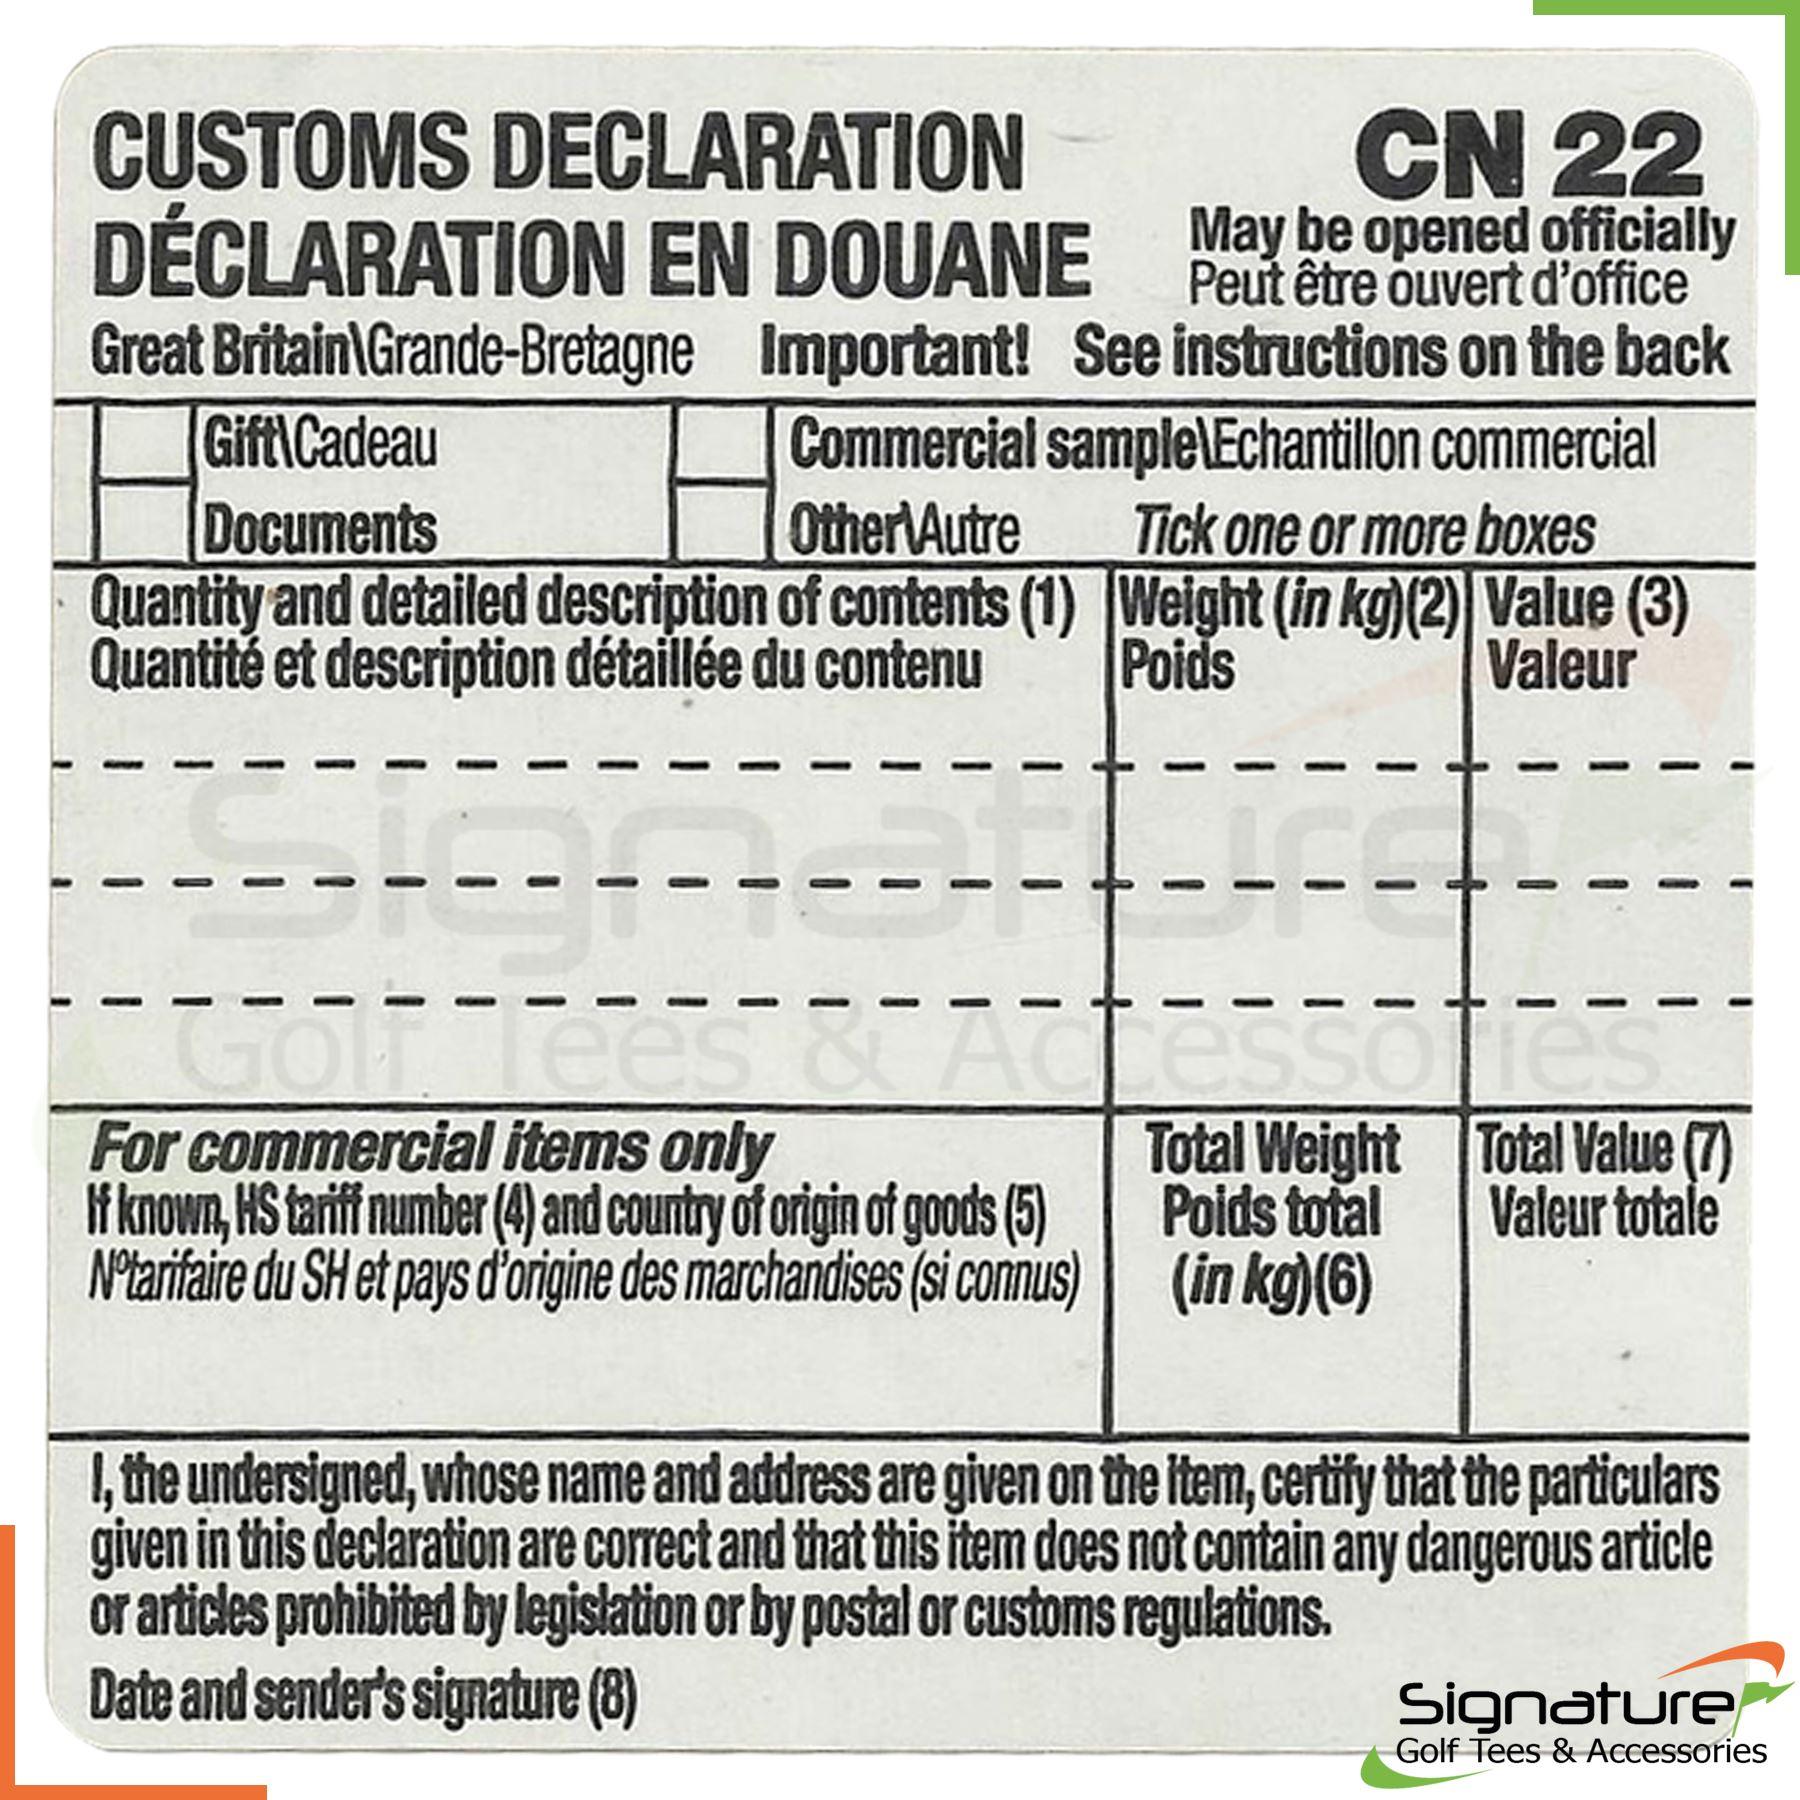 Self adhesive customs declaration forms label cn22 royal mail self adhesive customs declaration forms label cn22 royal mail various qtys ebay falaconquin